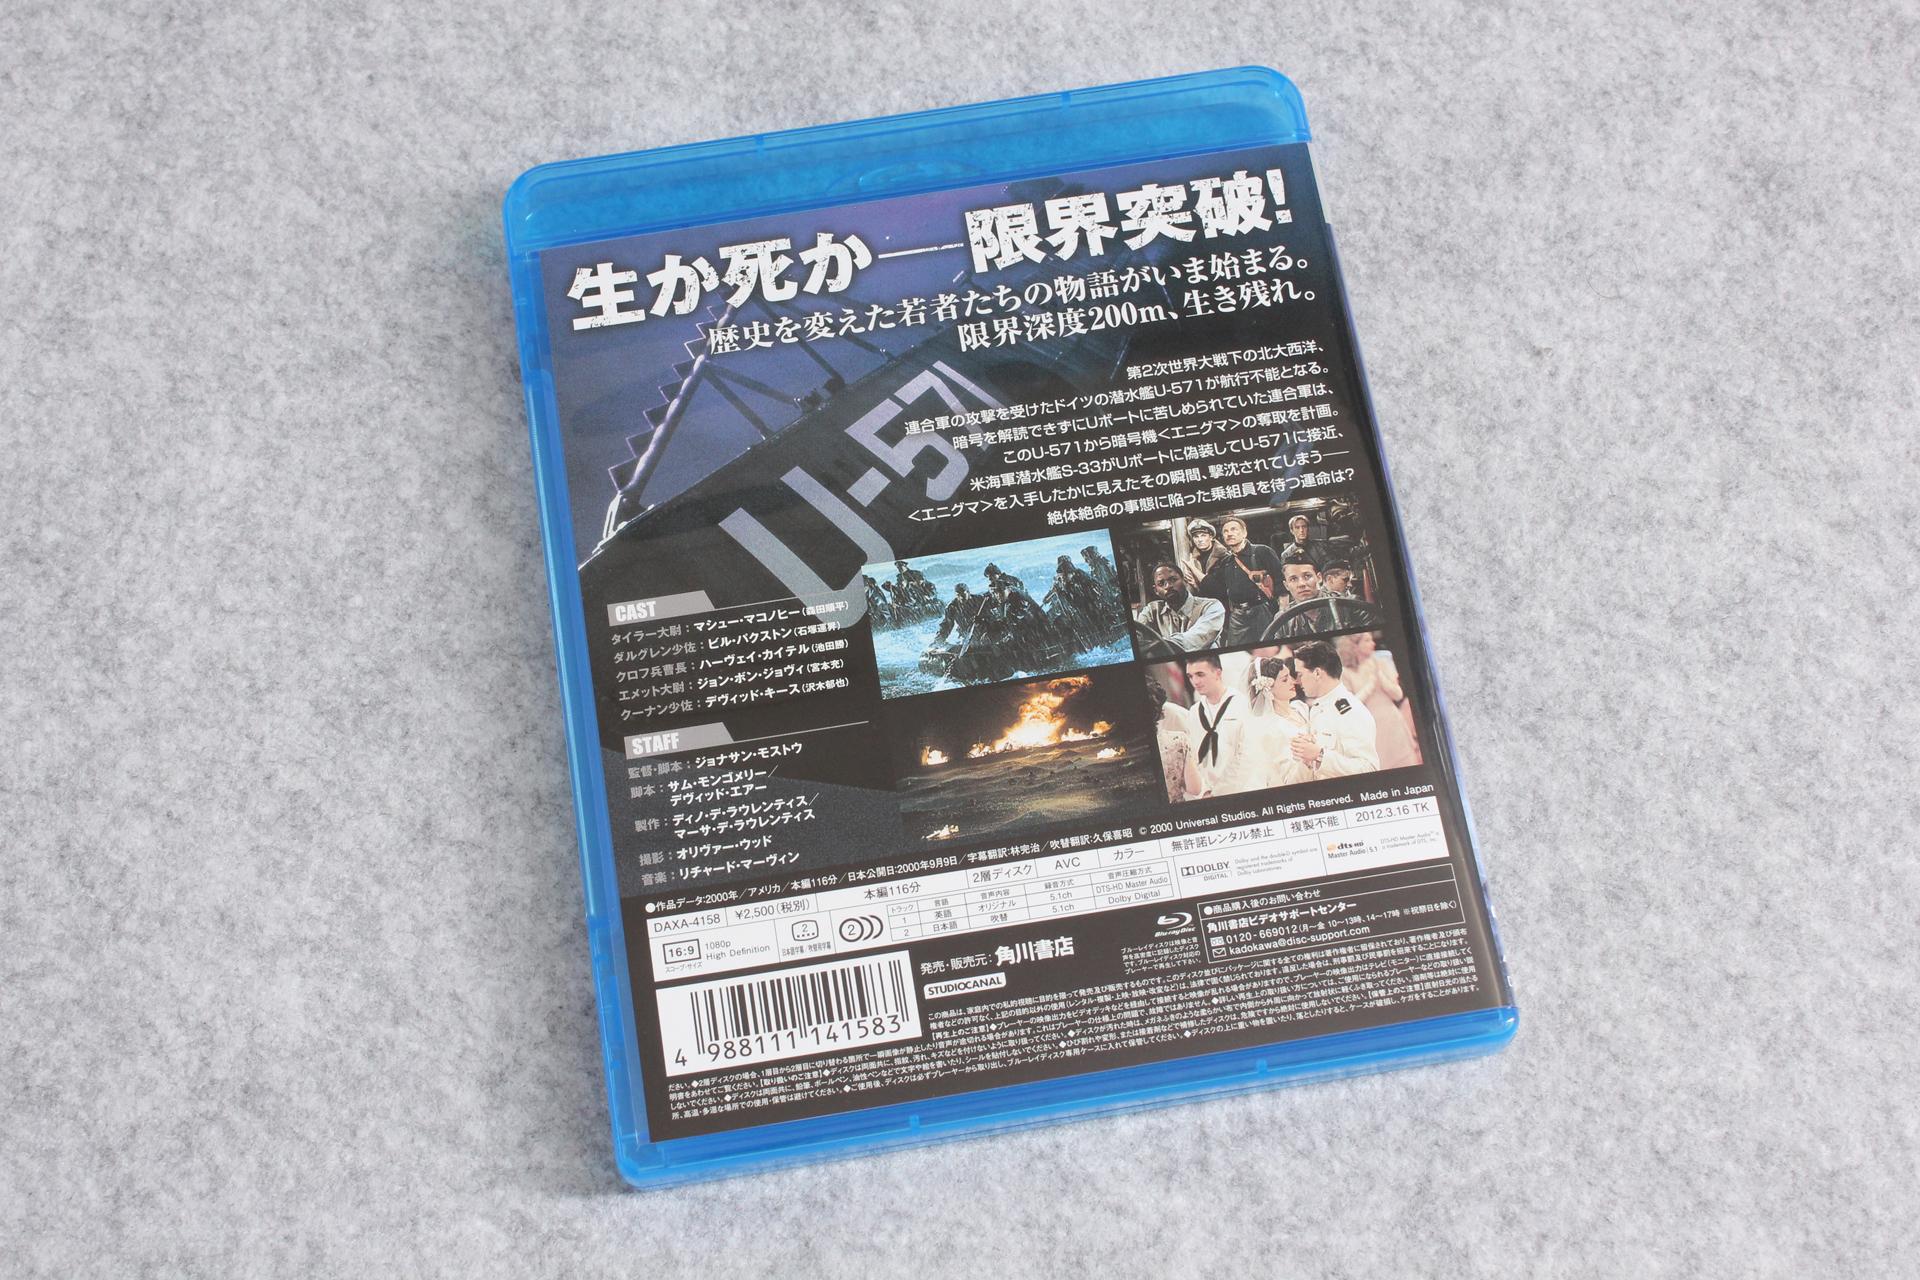 2020-02-27-U-571-KADOKAWA-BD-2.JPG